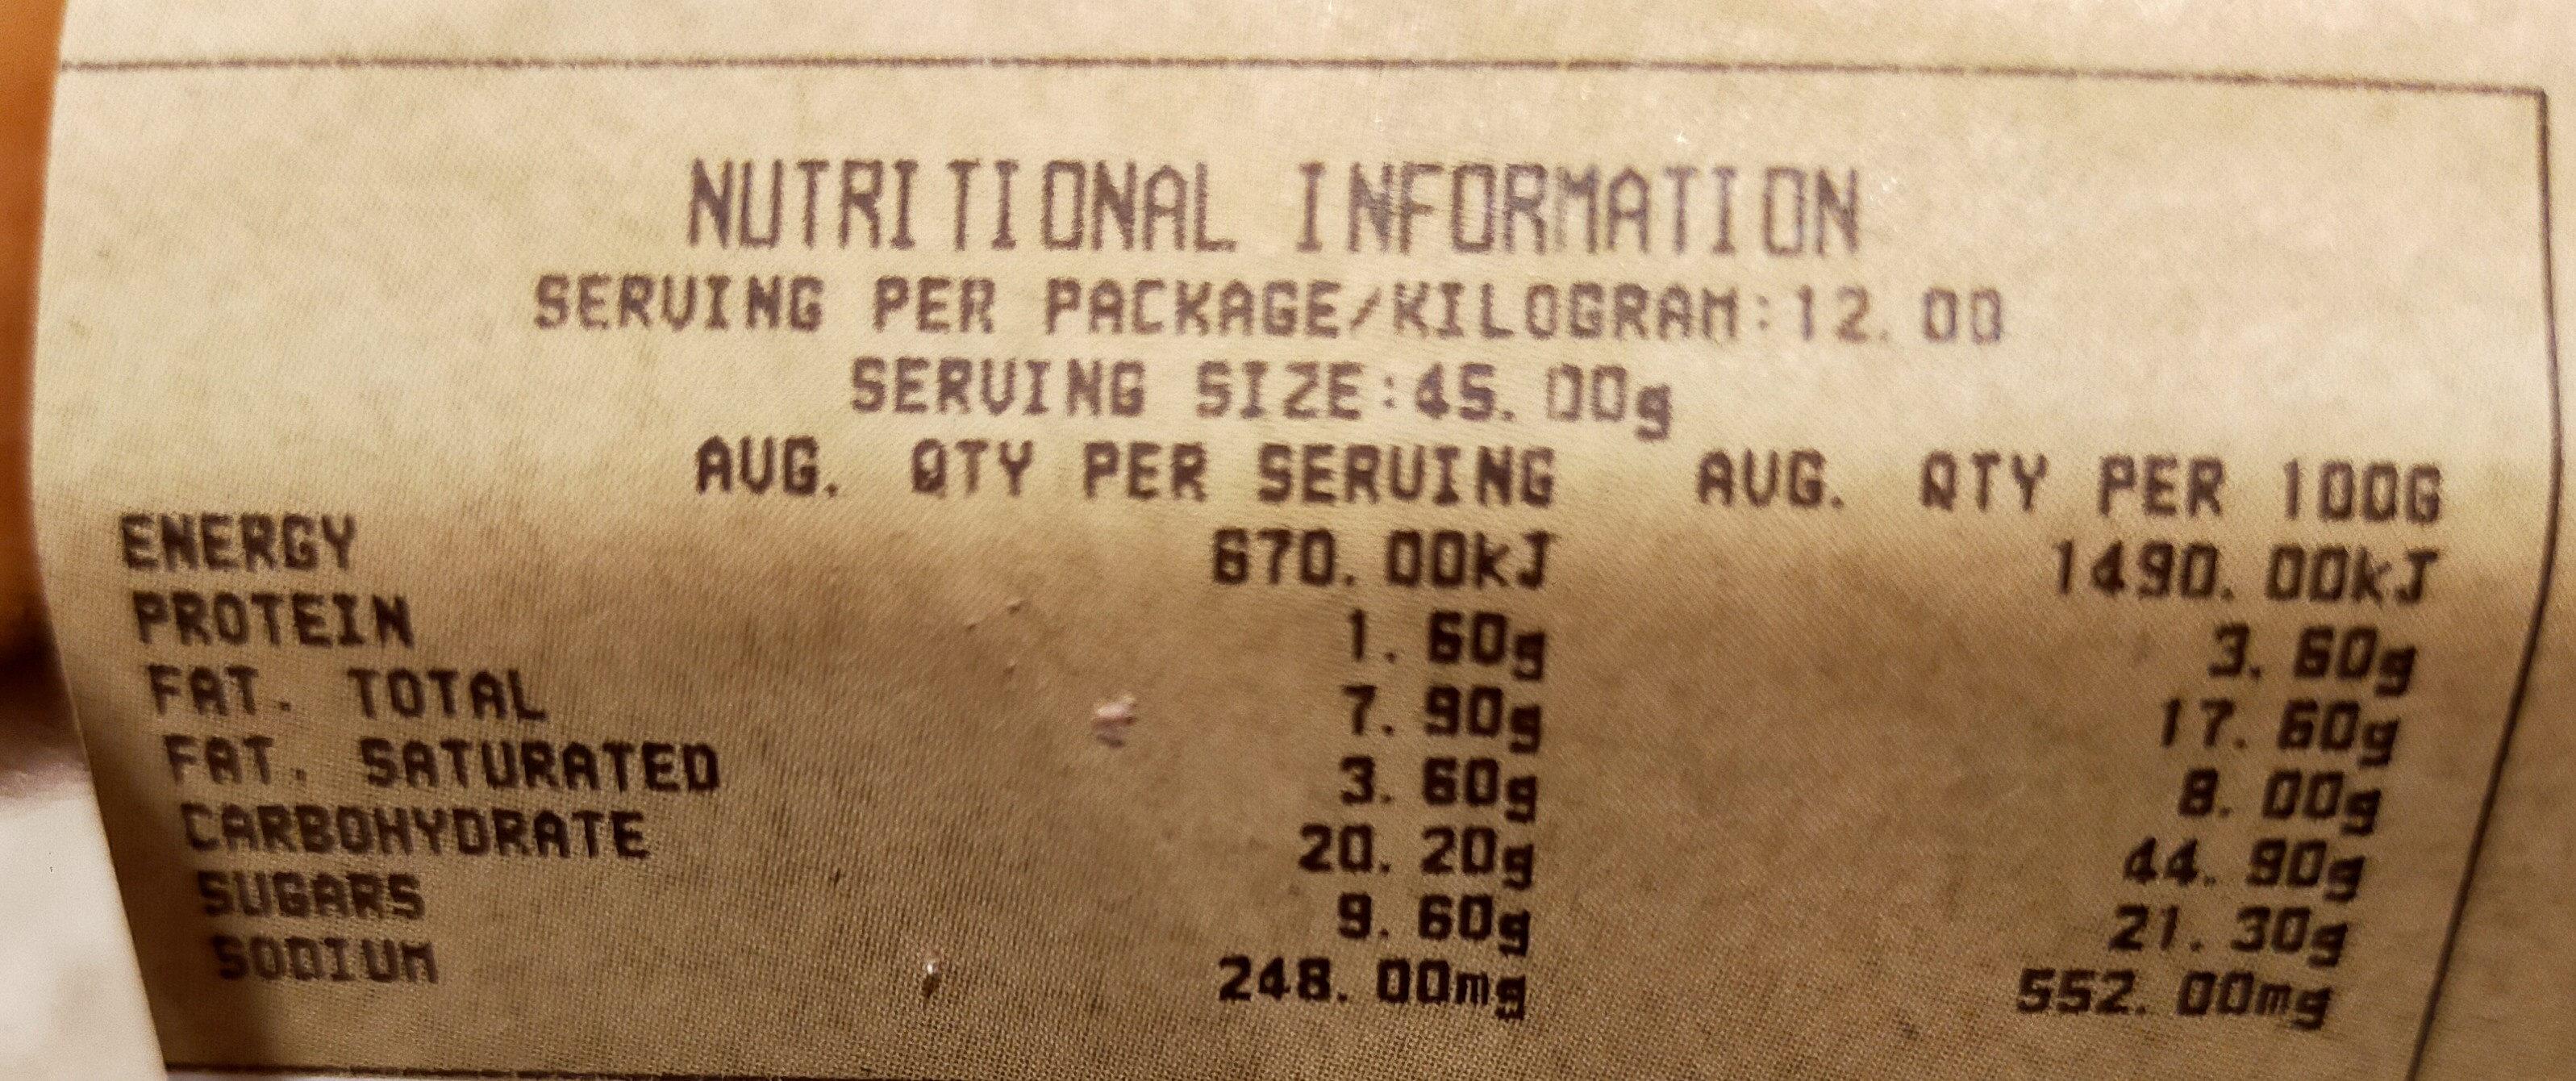 Cinnamon Donut 12pk - Informations nutritionnelles - en